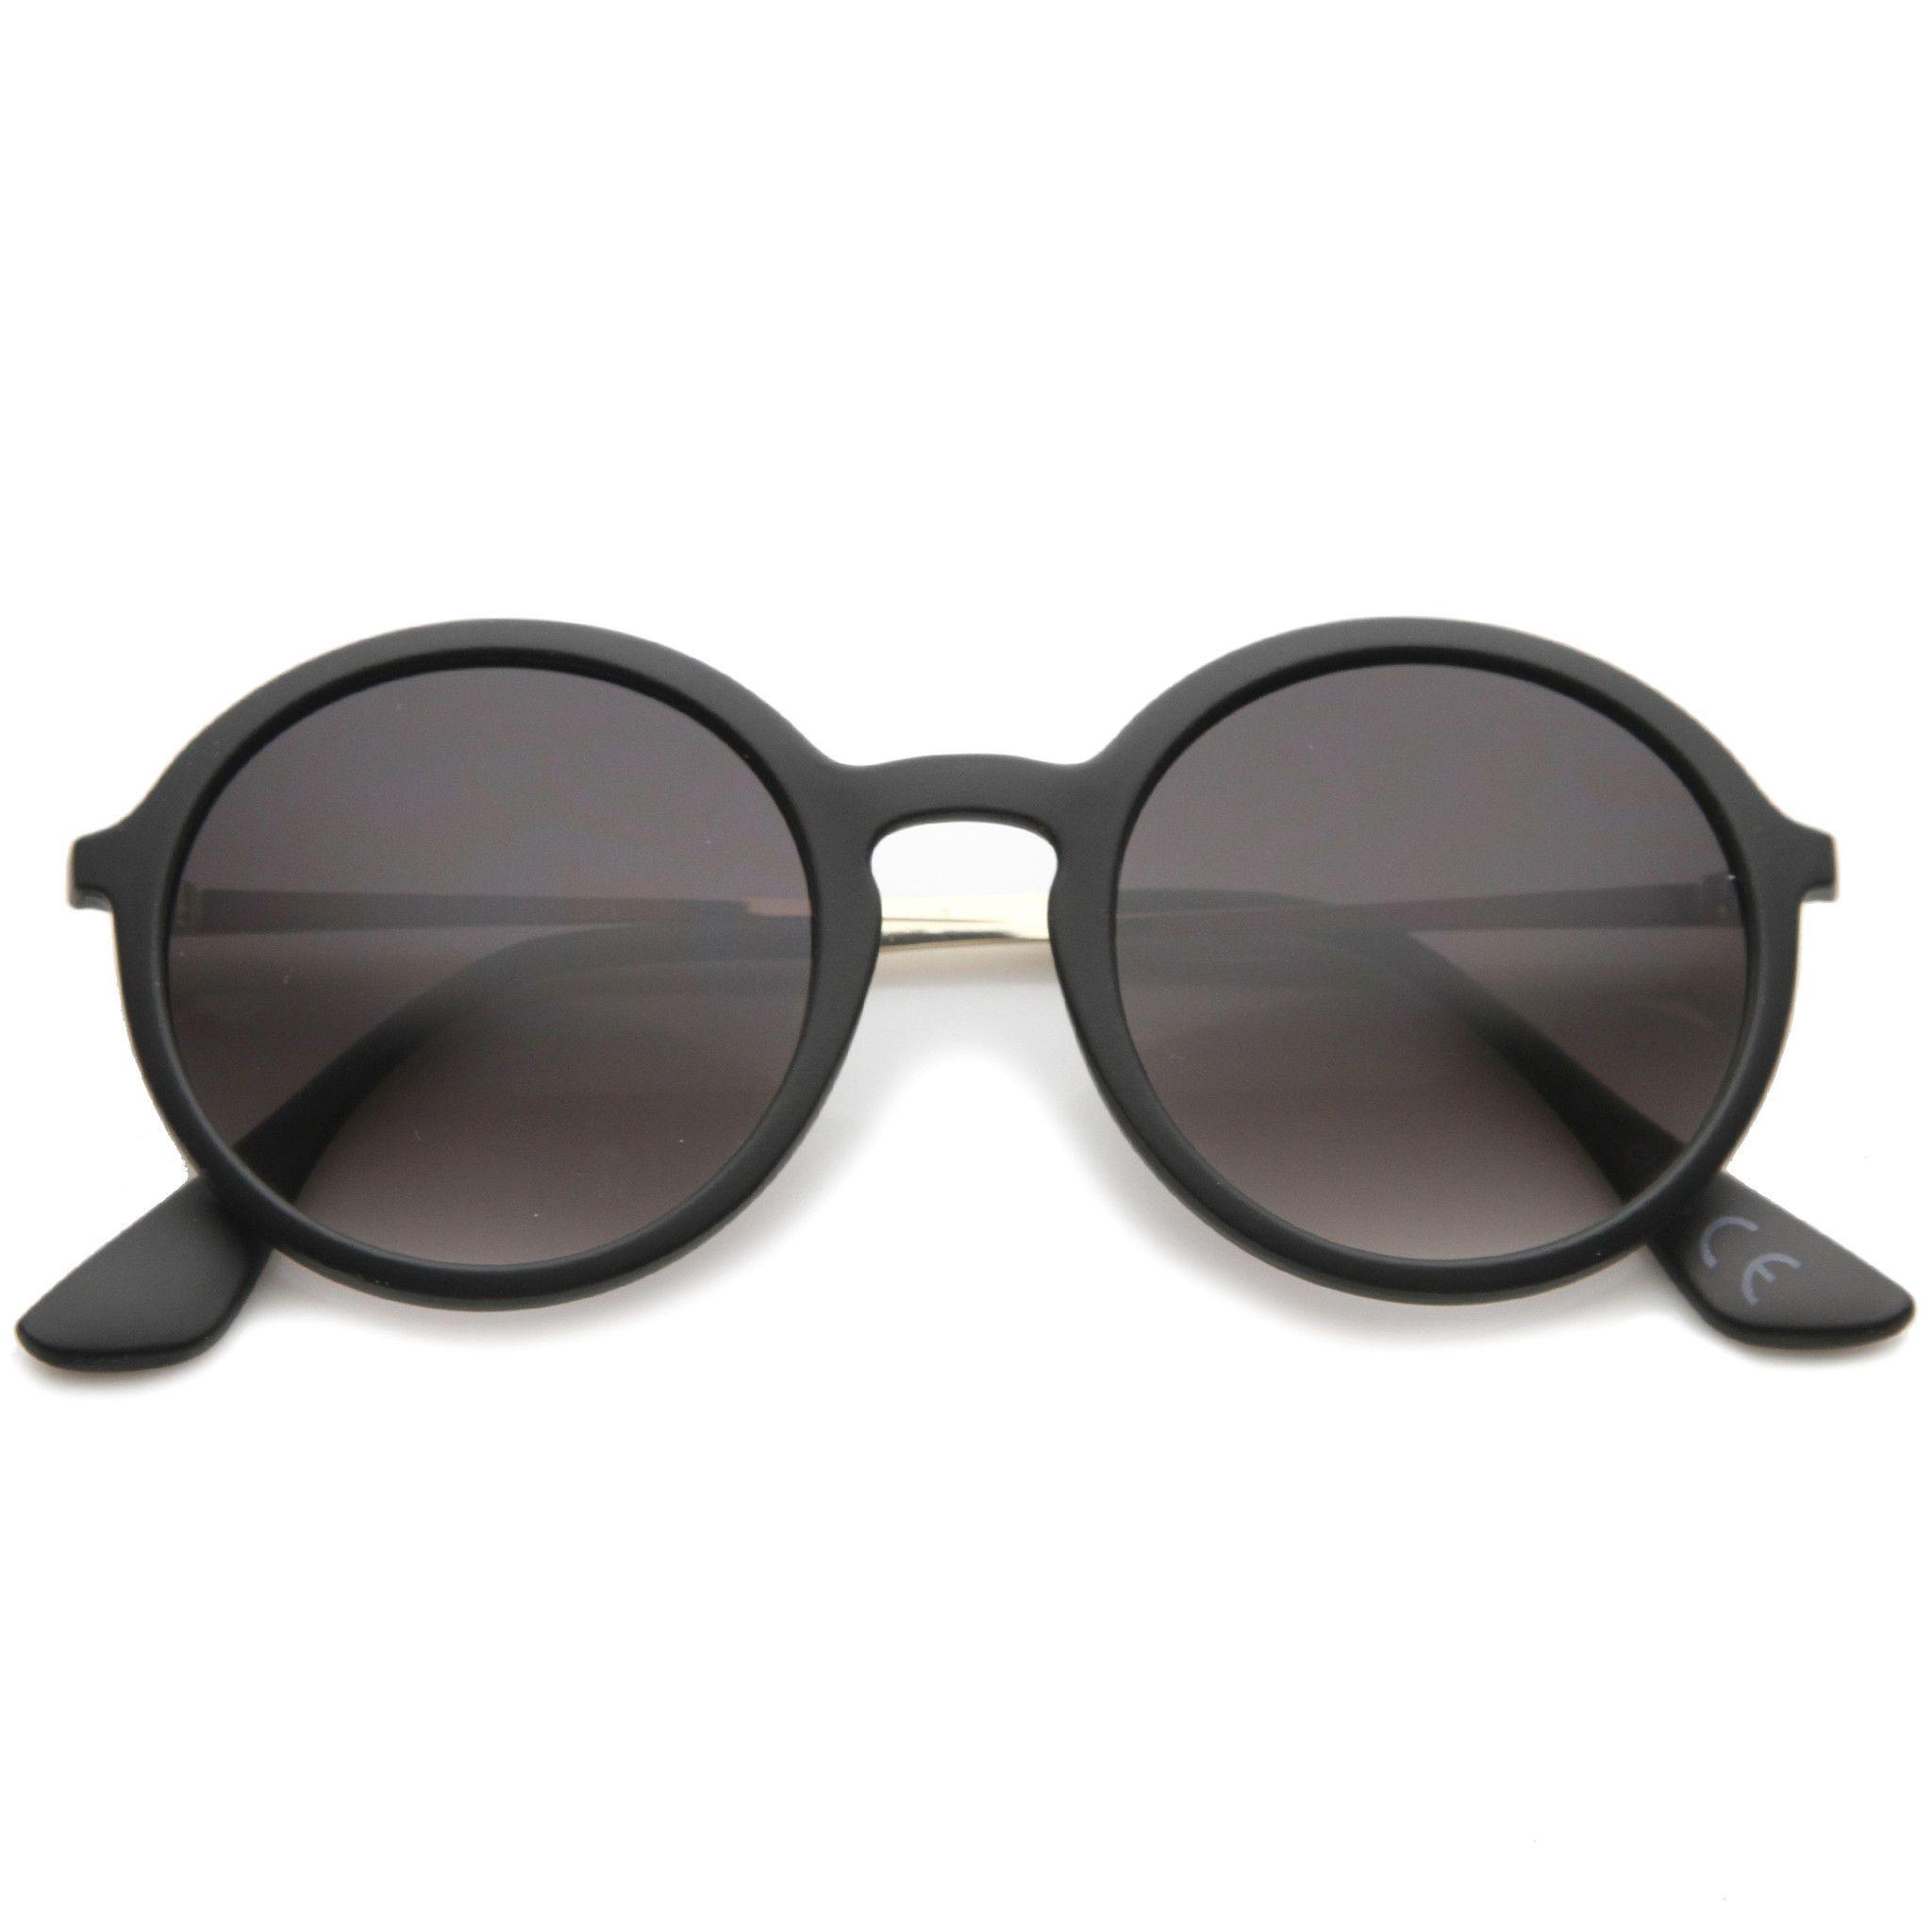 82edfd74372 Mid Size Modern Metal Temple Gradient Lens Round Sunglasses 49mm  sunglasses   sunglass  frame  sunglassla  womens  purple  summer  clear  bold  cateye